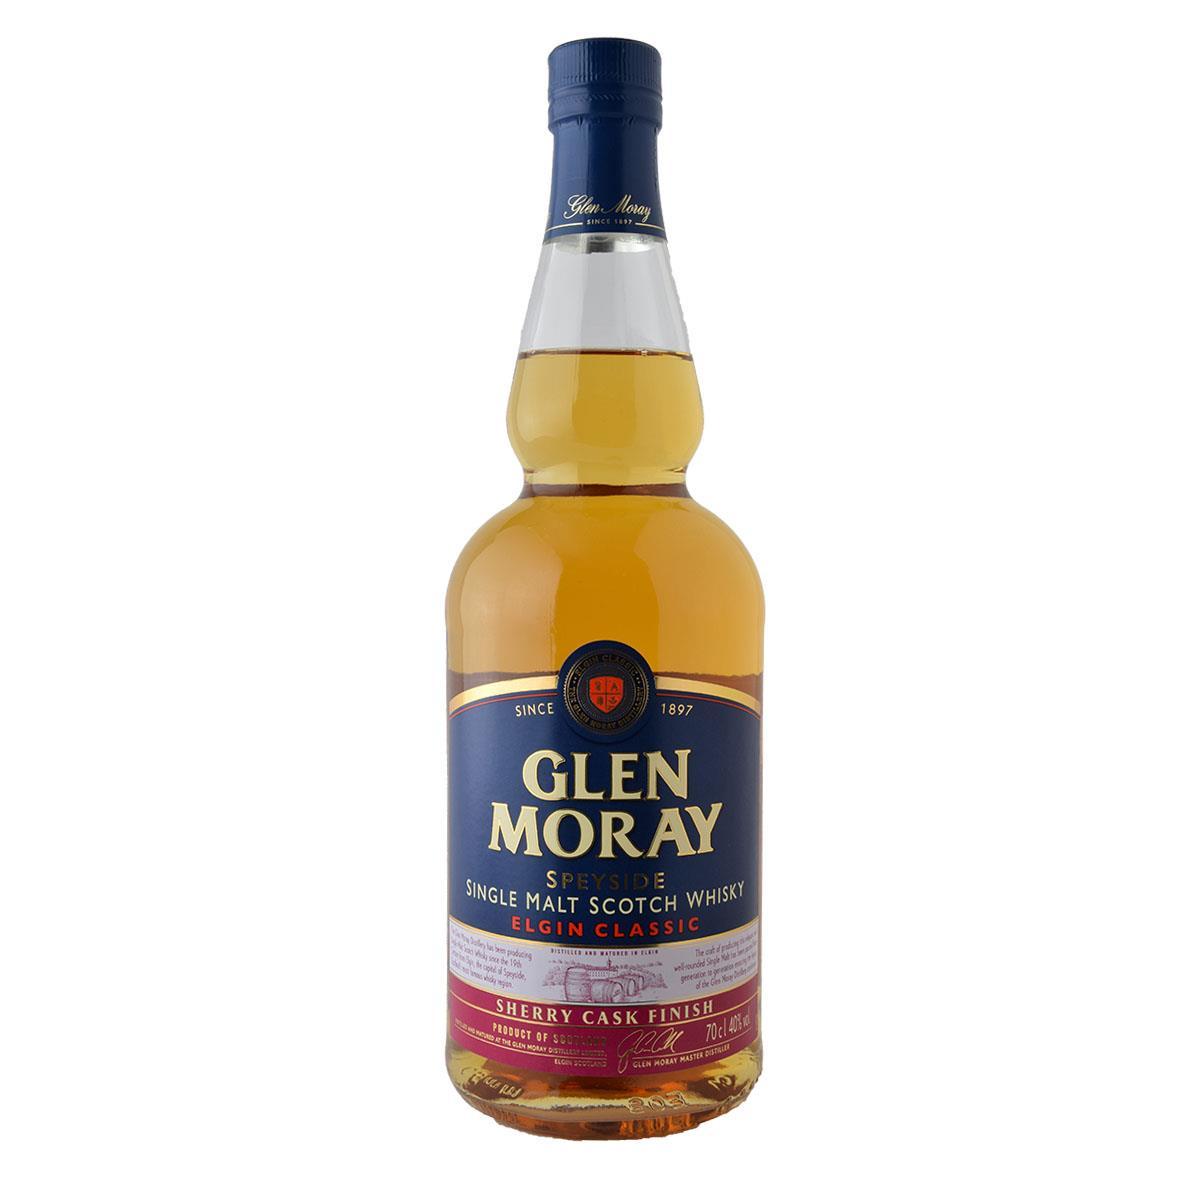 Glen Moray Sherry Cask Finish 700ml